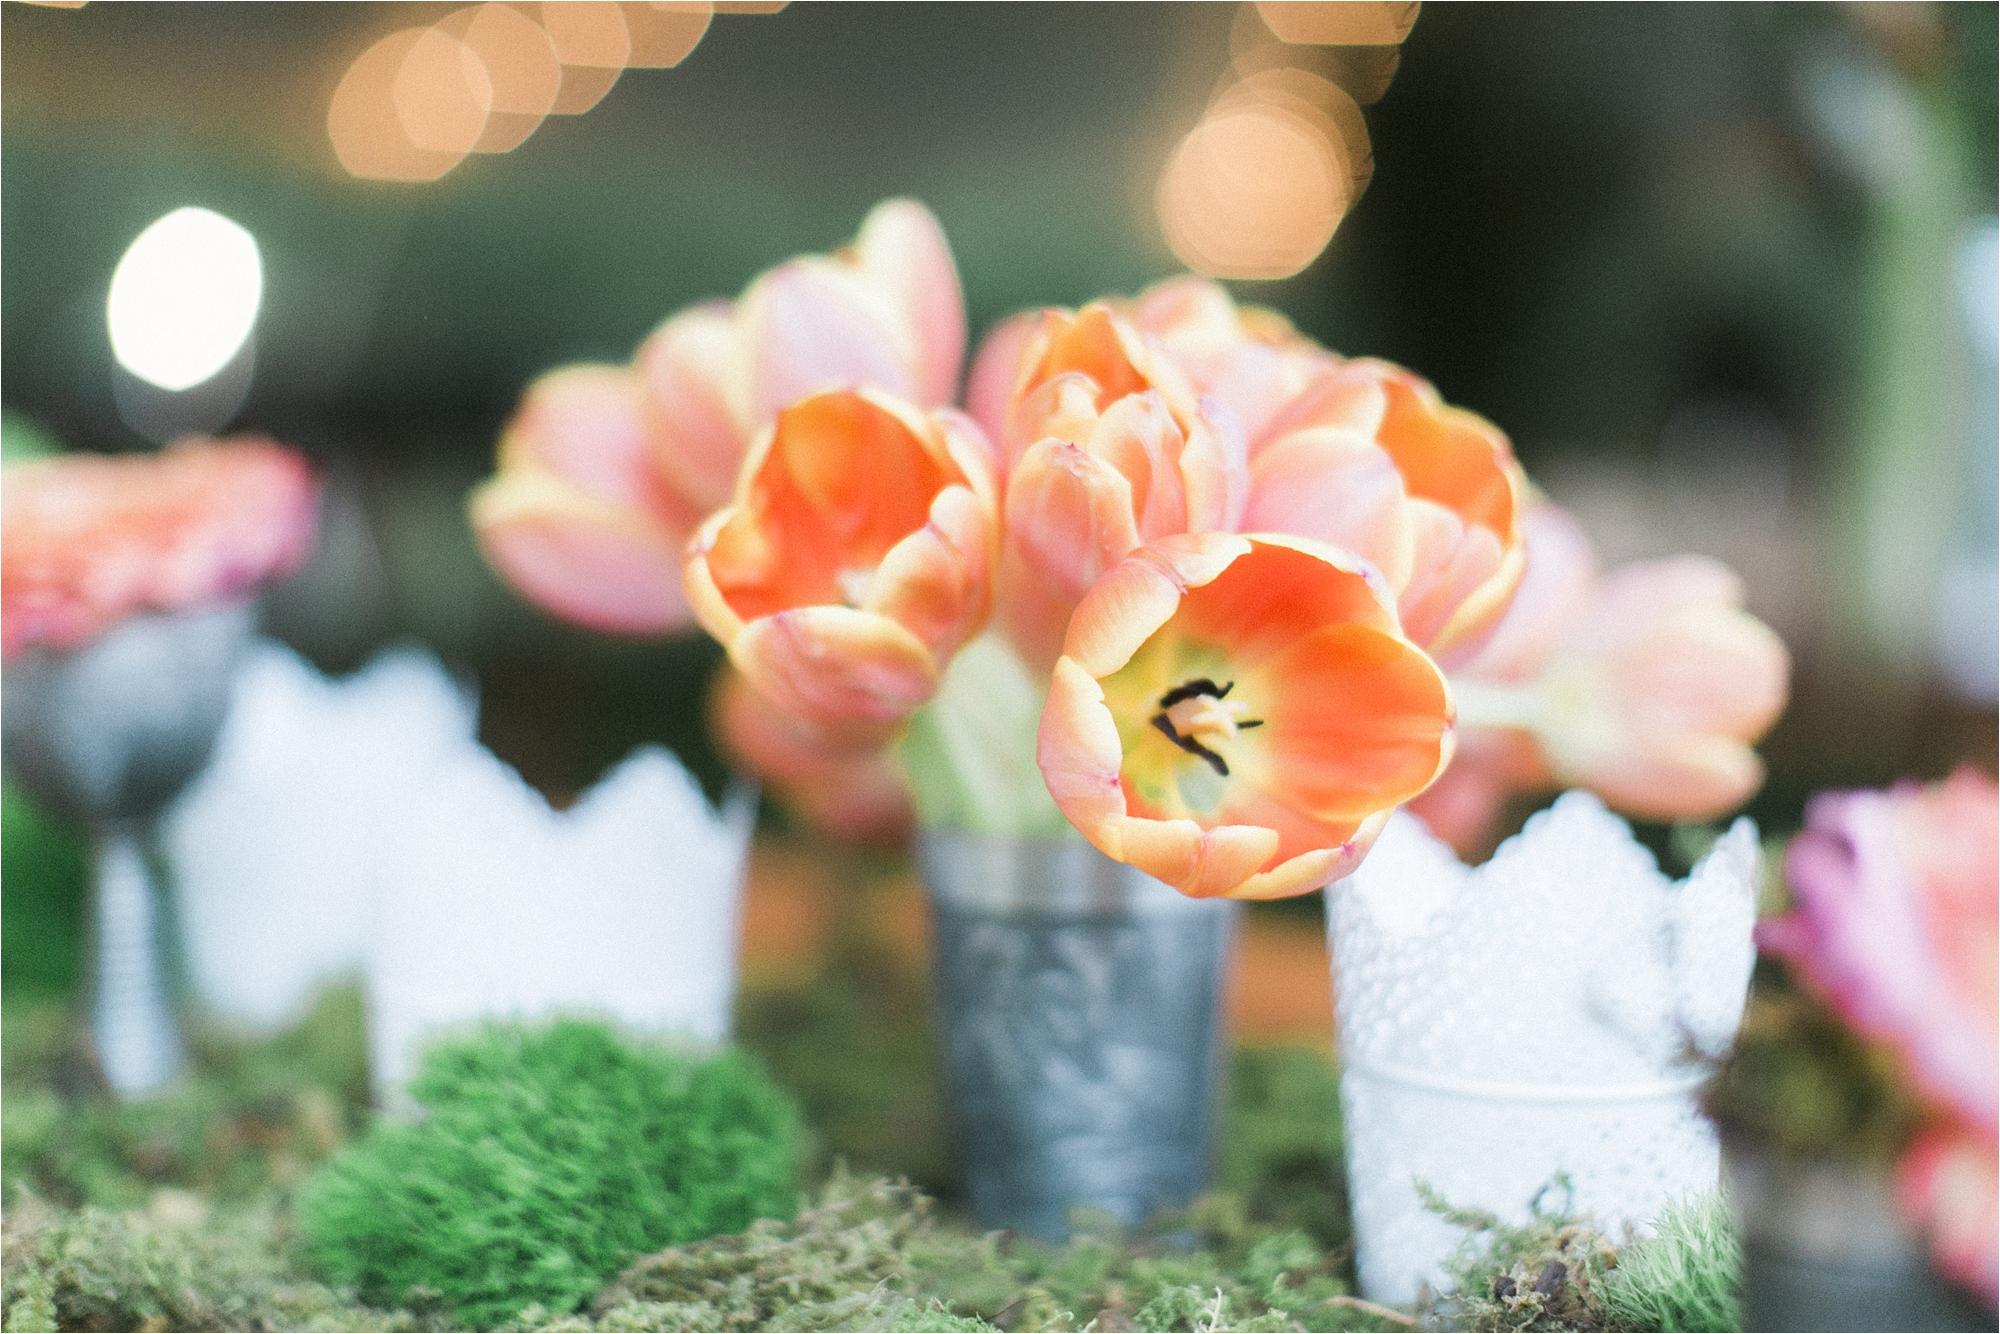 richmond-virginia-tuckahoe-plantation-coral-summer-wedding-stephanie-yonce-photos_0053.jpg